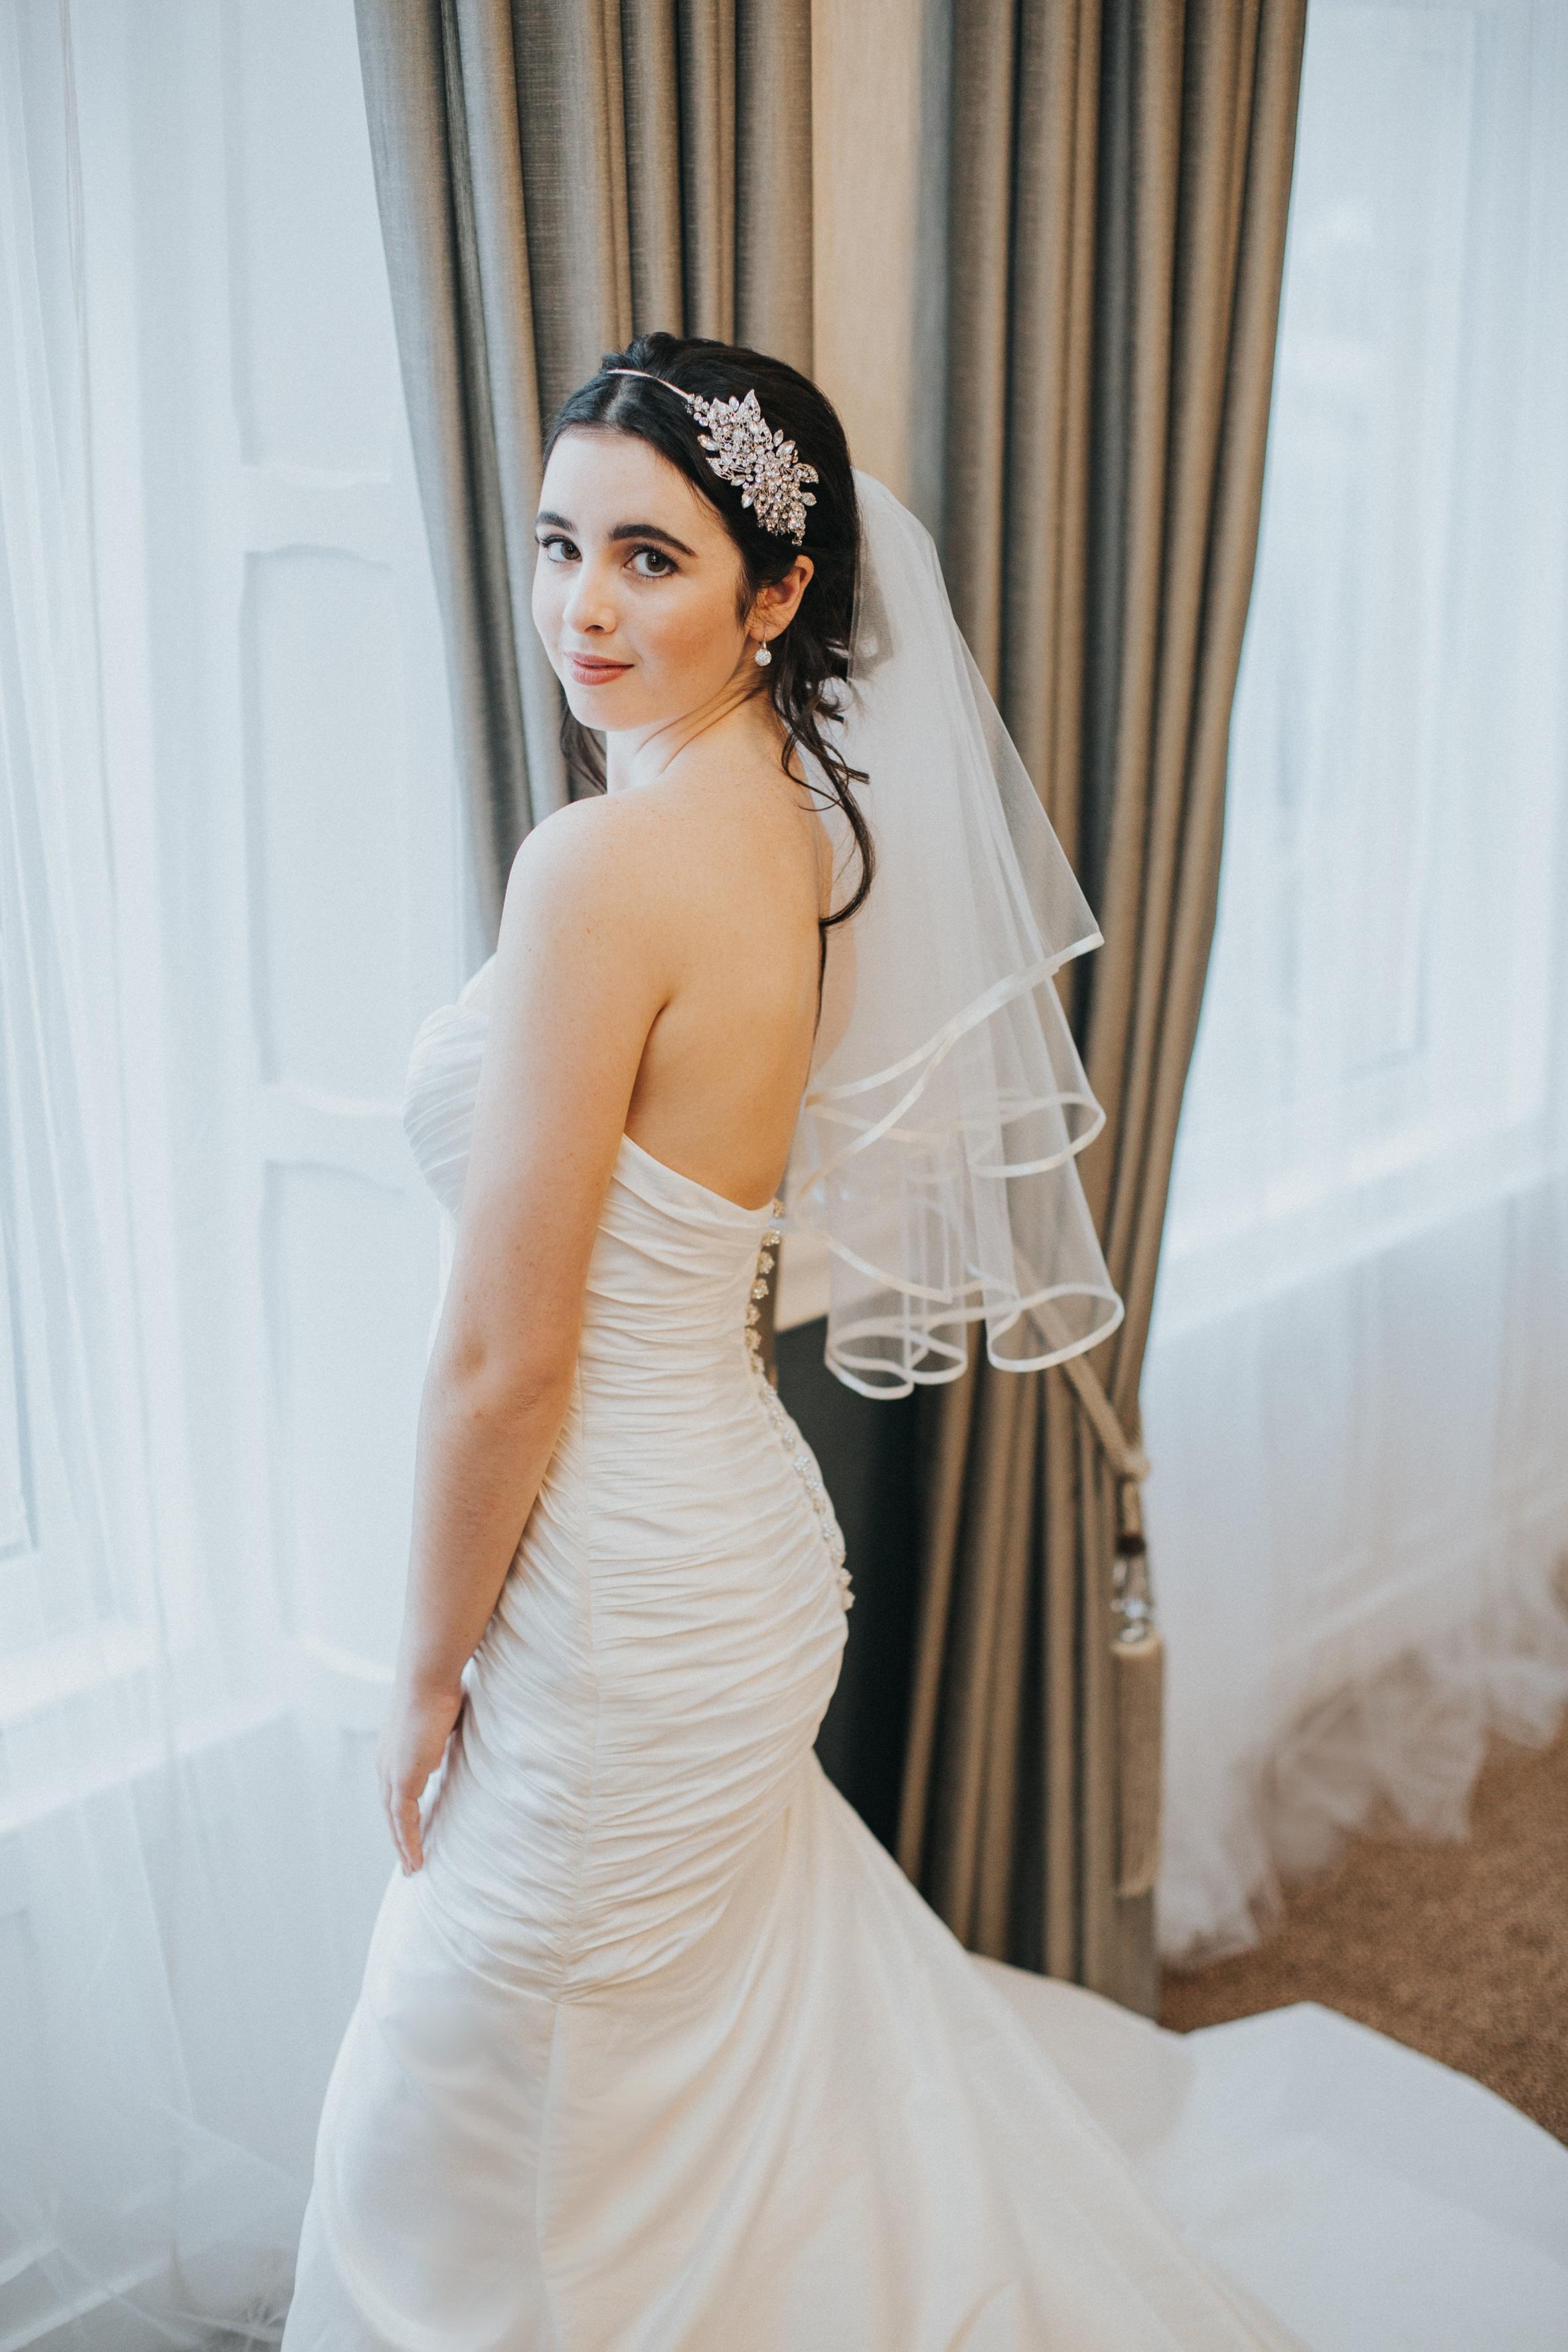 Fingertip Length Wedding Veil Embroidered Edge Wedding Veil New Wedding Veil Scallop Edge Wedding Veil